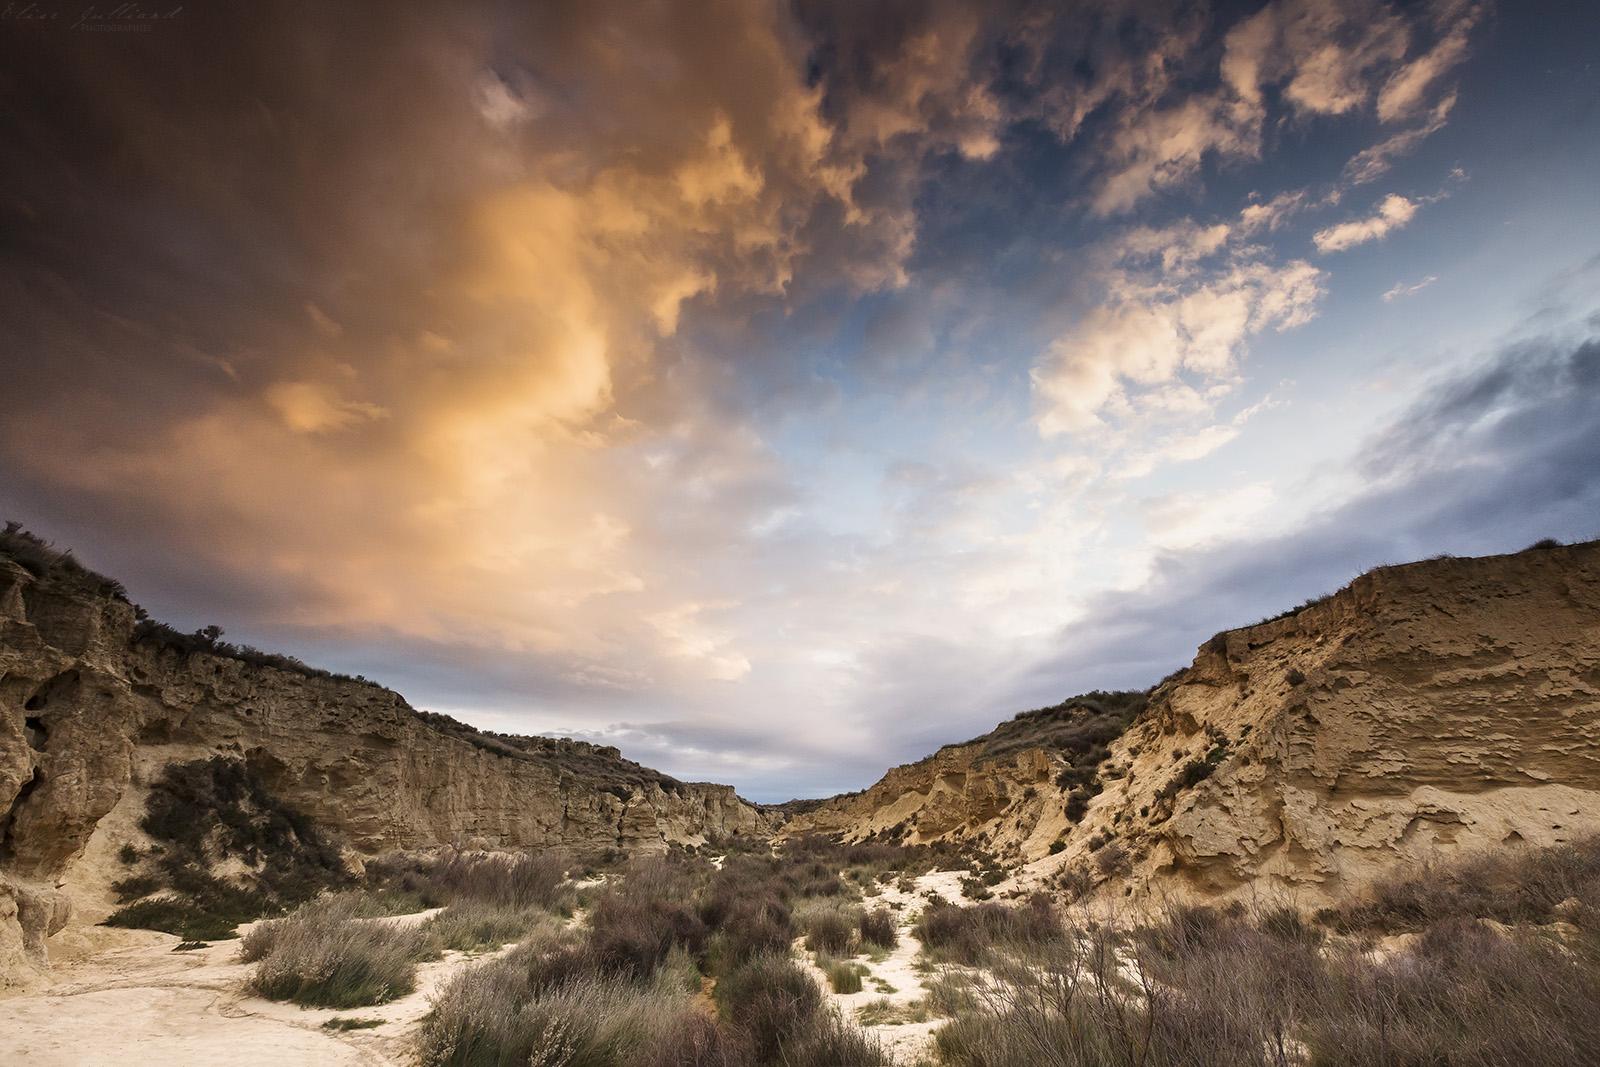 voyage-travel-espagne-tudela-bardenas-reales-navarre-arguedas-desert-paysage-elise-julliard-photographe-lyon-montagne-landscape-espana-coucher-de-soleil-sunset